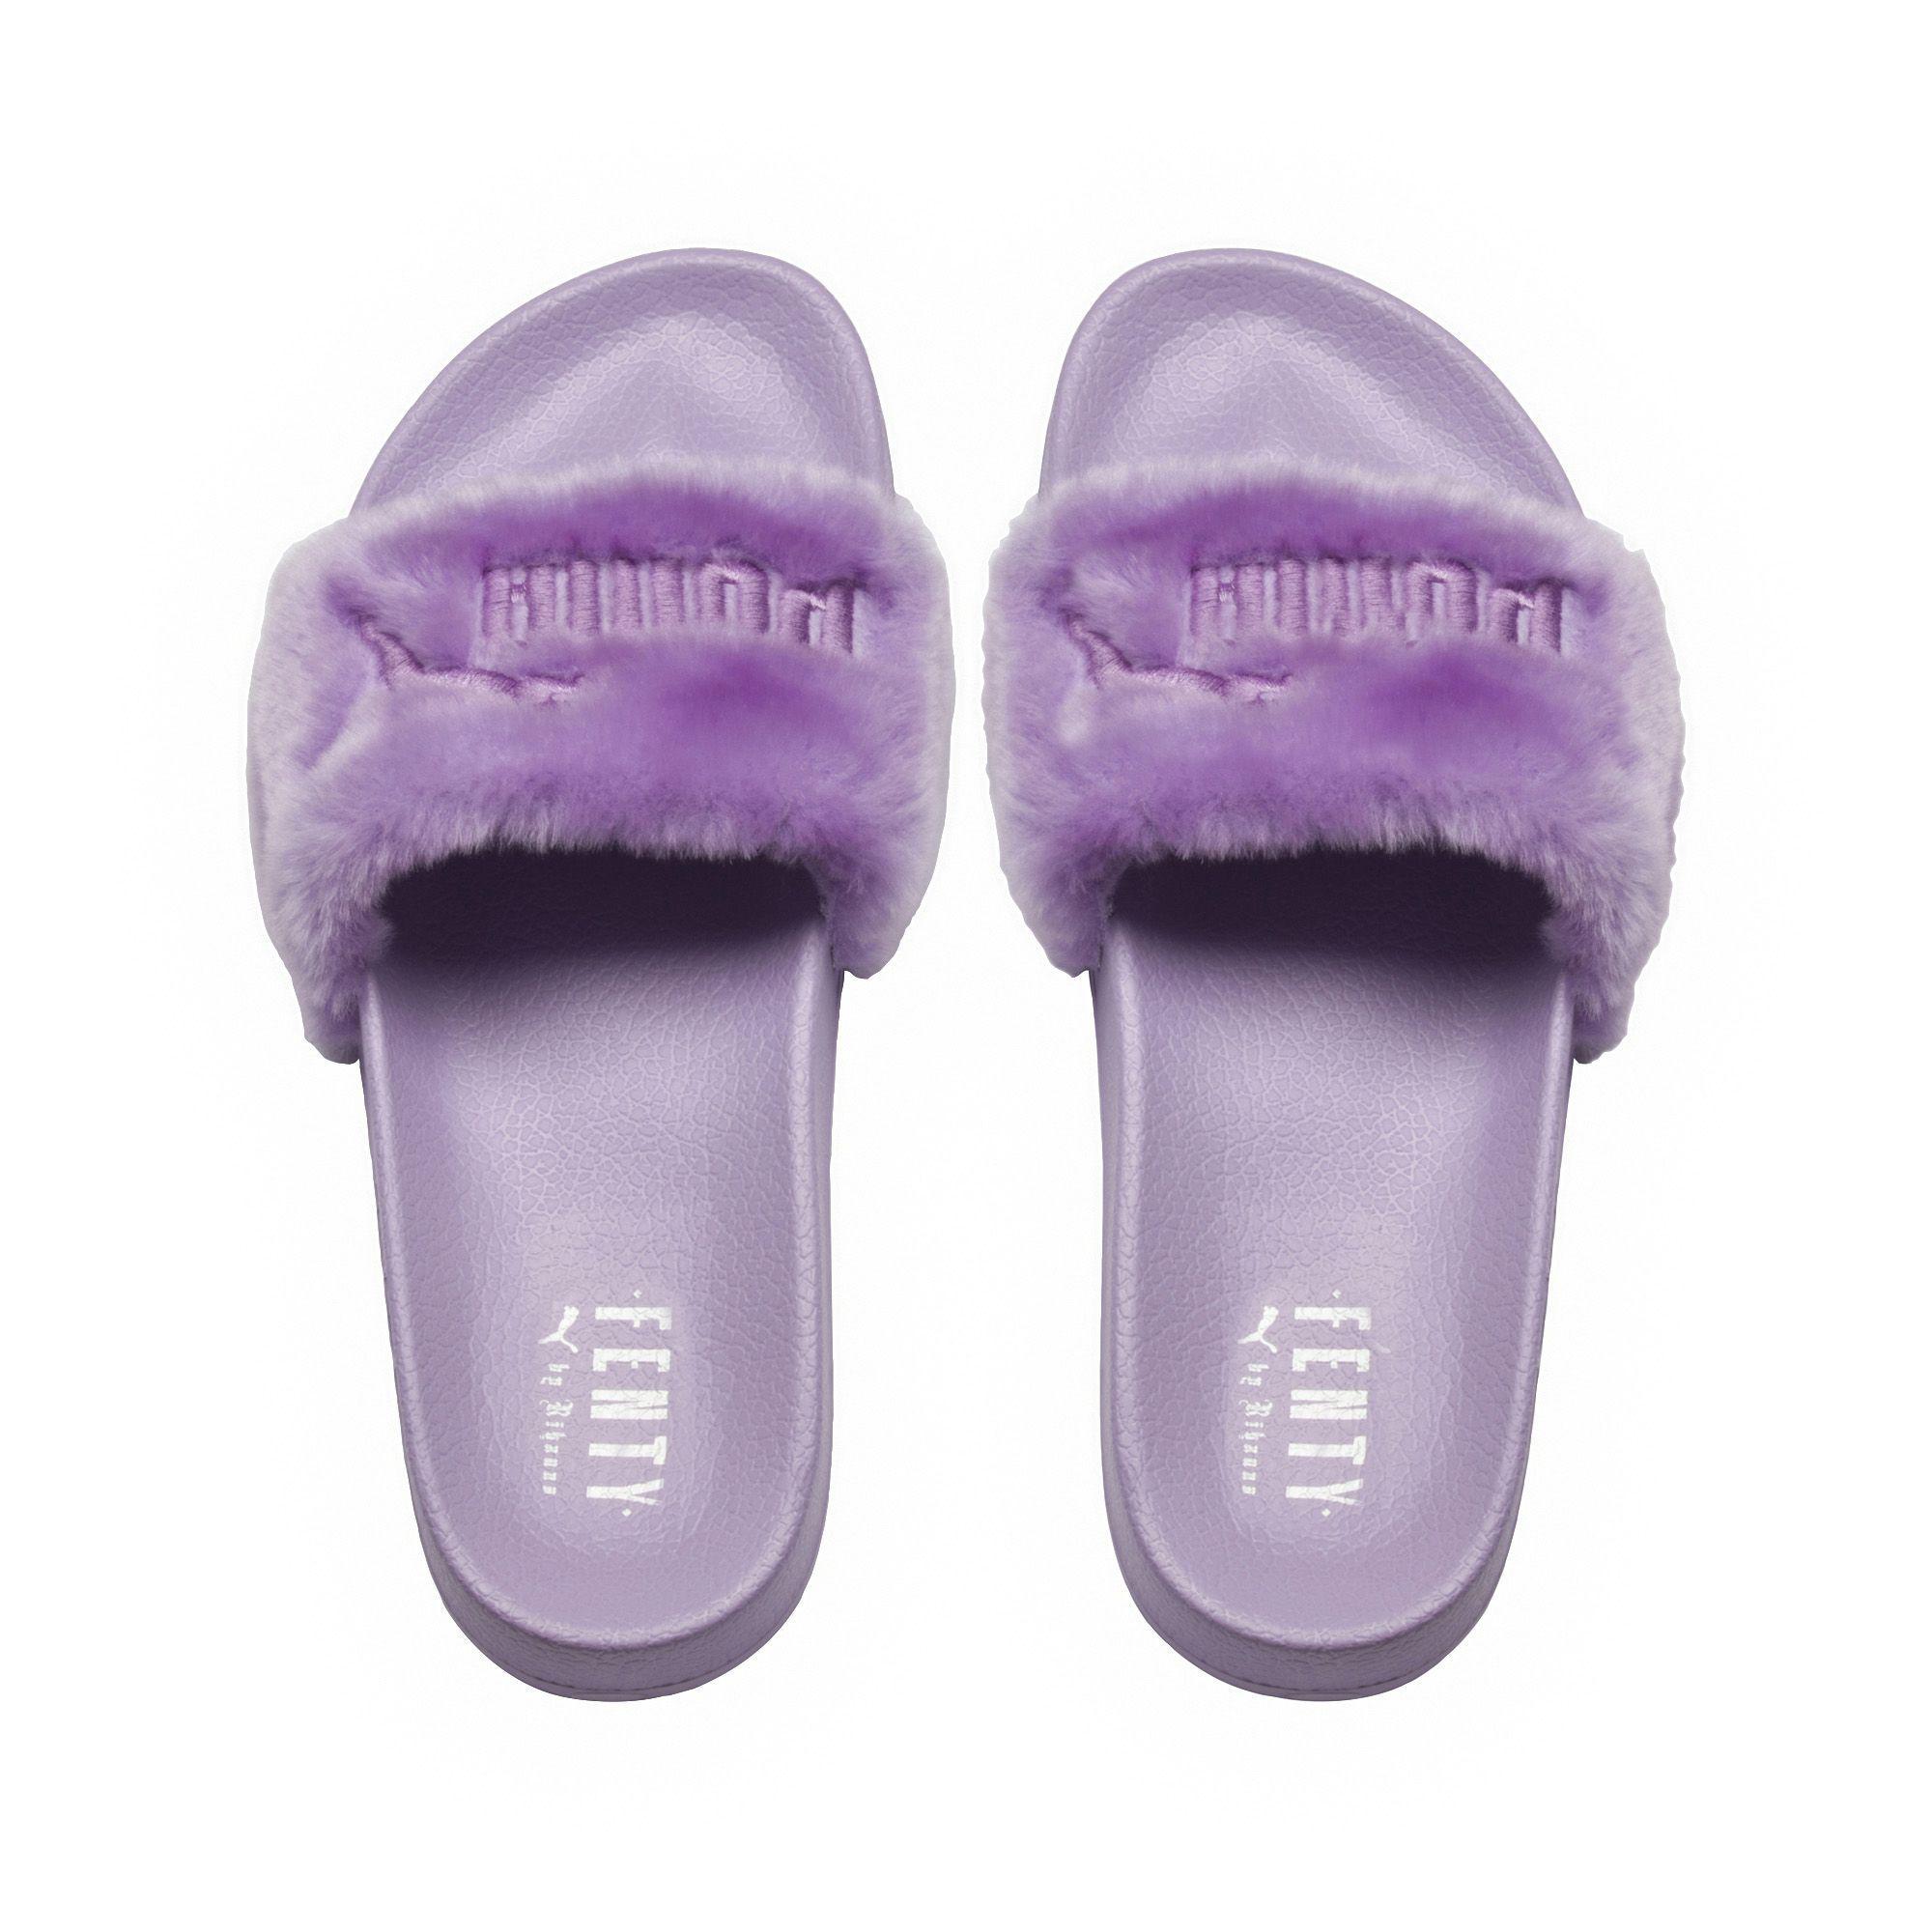 Lyst - PUMA Fenty Fur Women s Slide Sandals in Purple 17ad636545